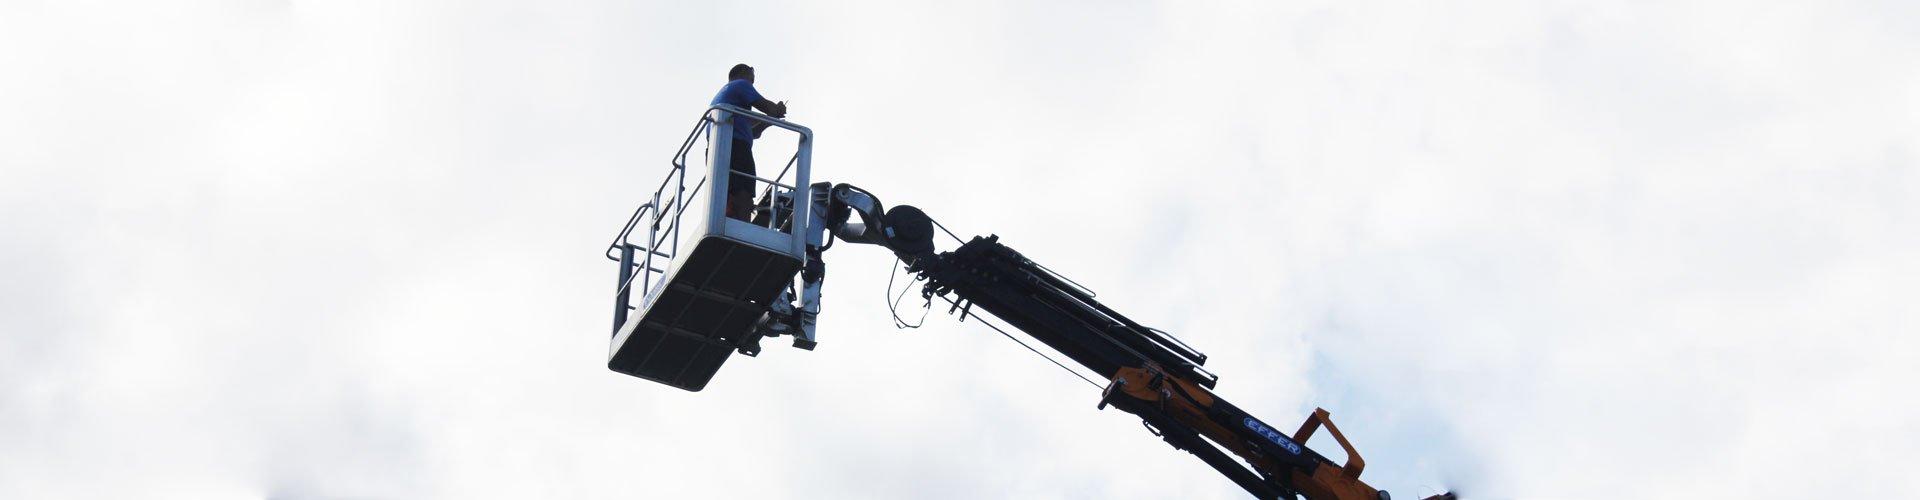 Crane Equipments